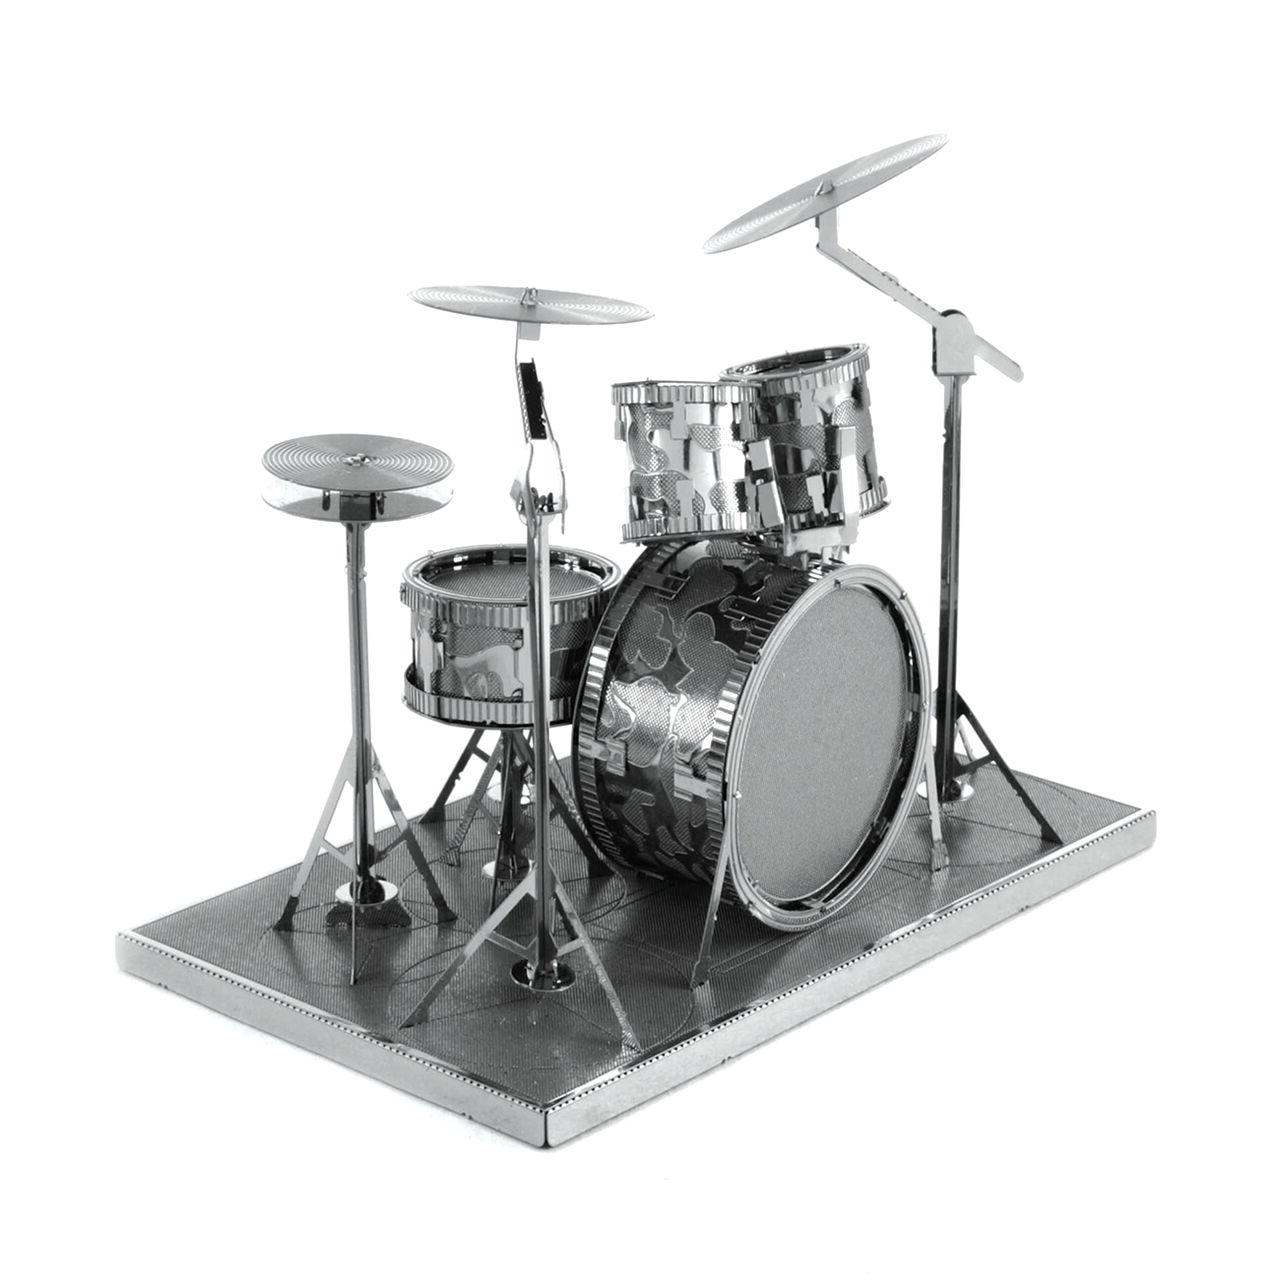 Fascinations Metal Earth Drum Cut Kit